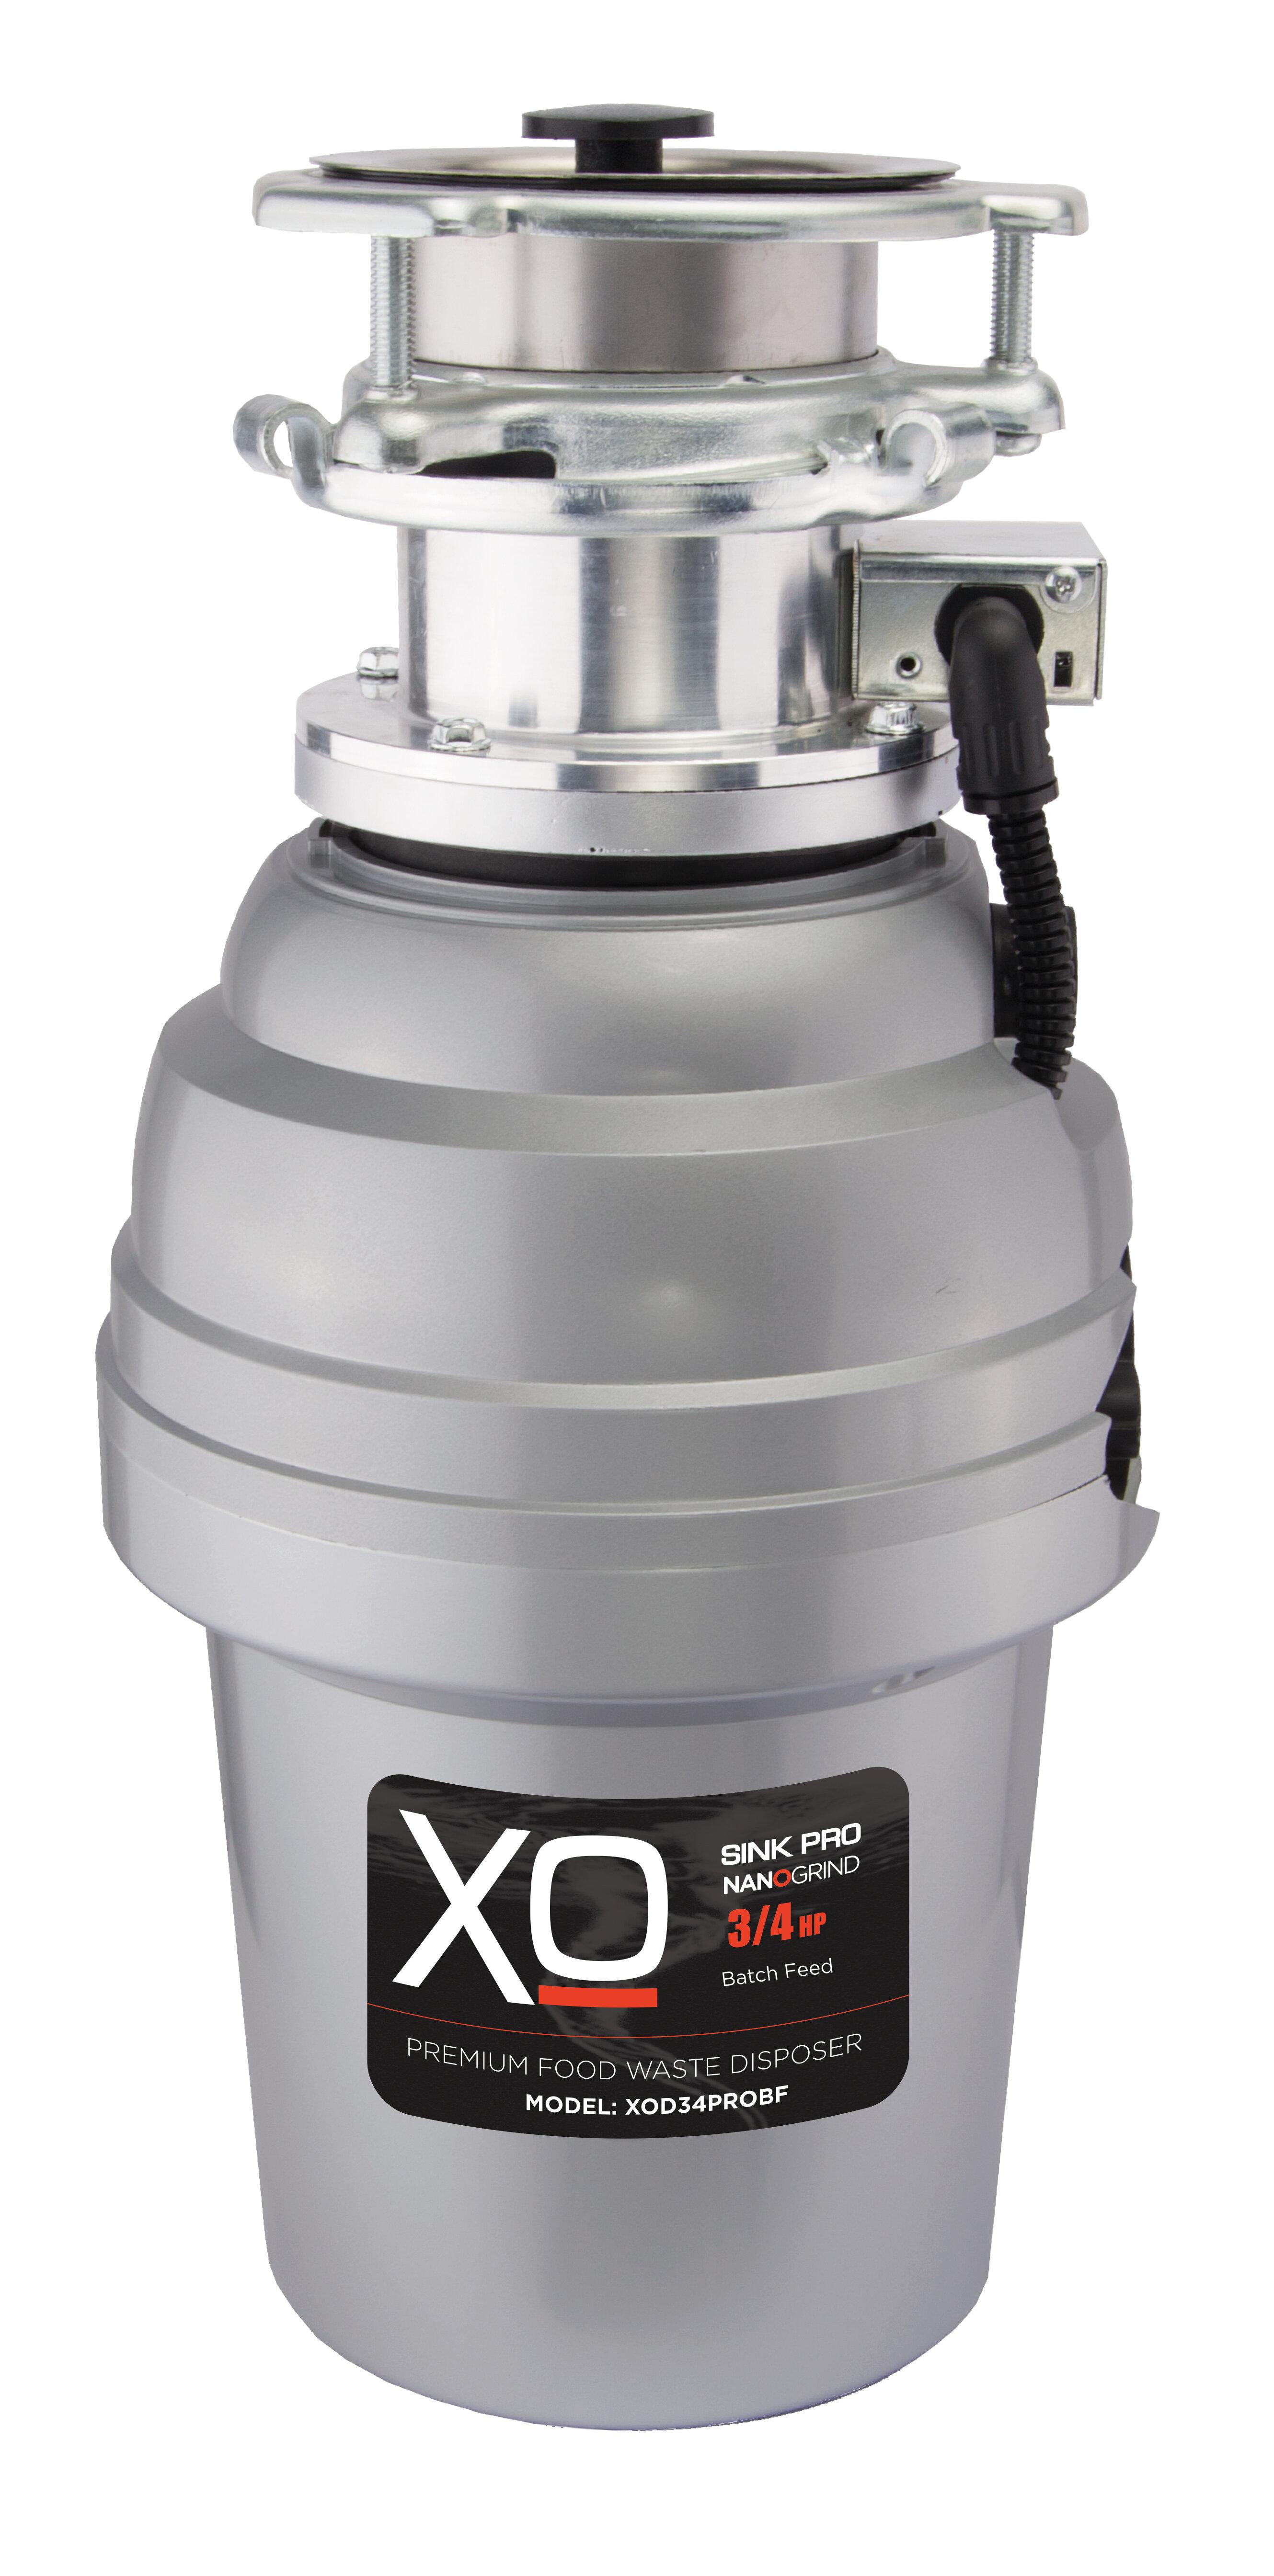 Xo Appliance 3 4 Hp Batch Feed Garbage Disposal Wayfair